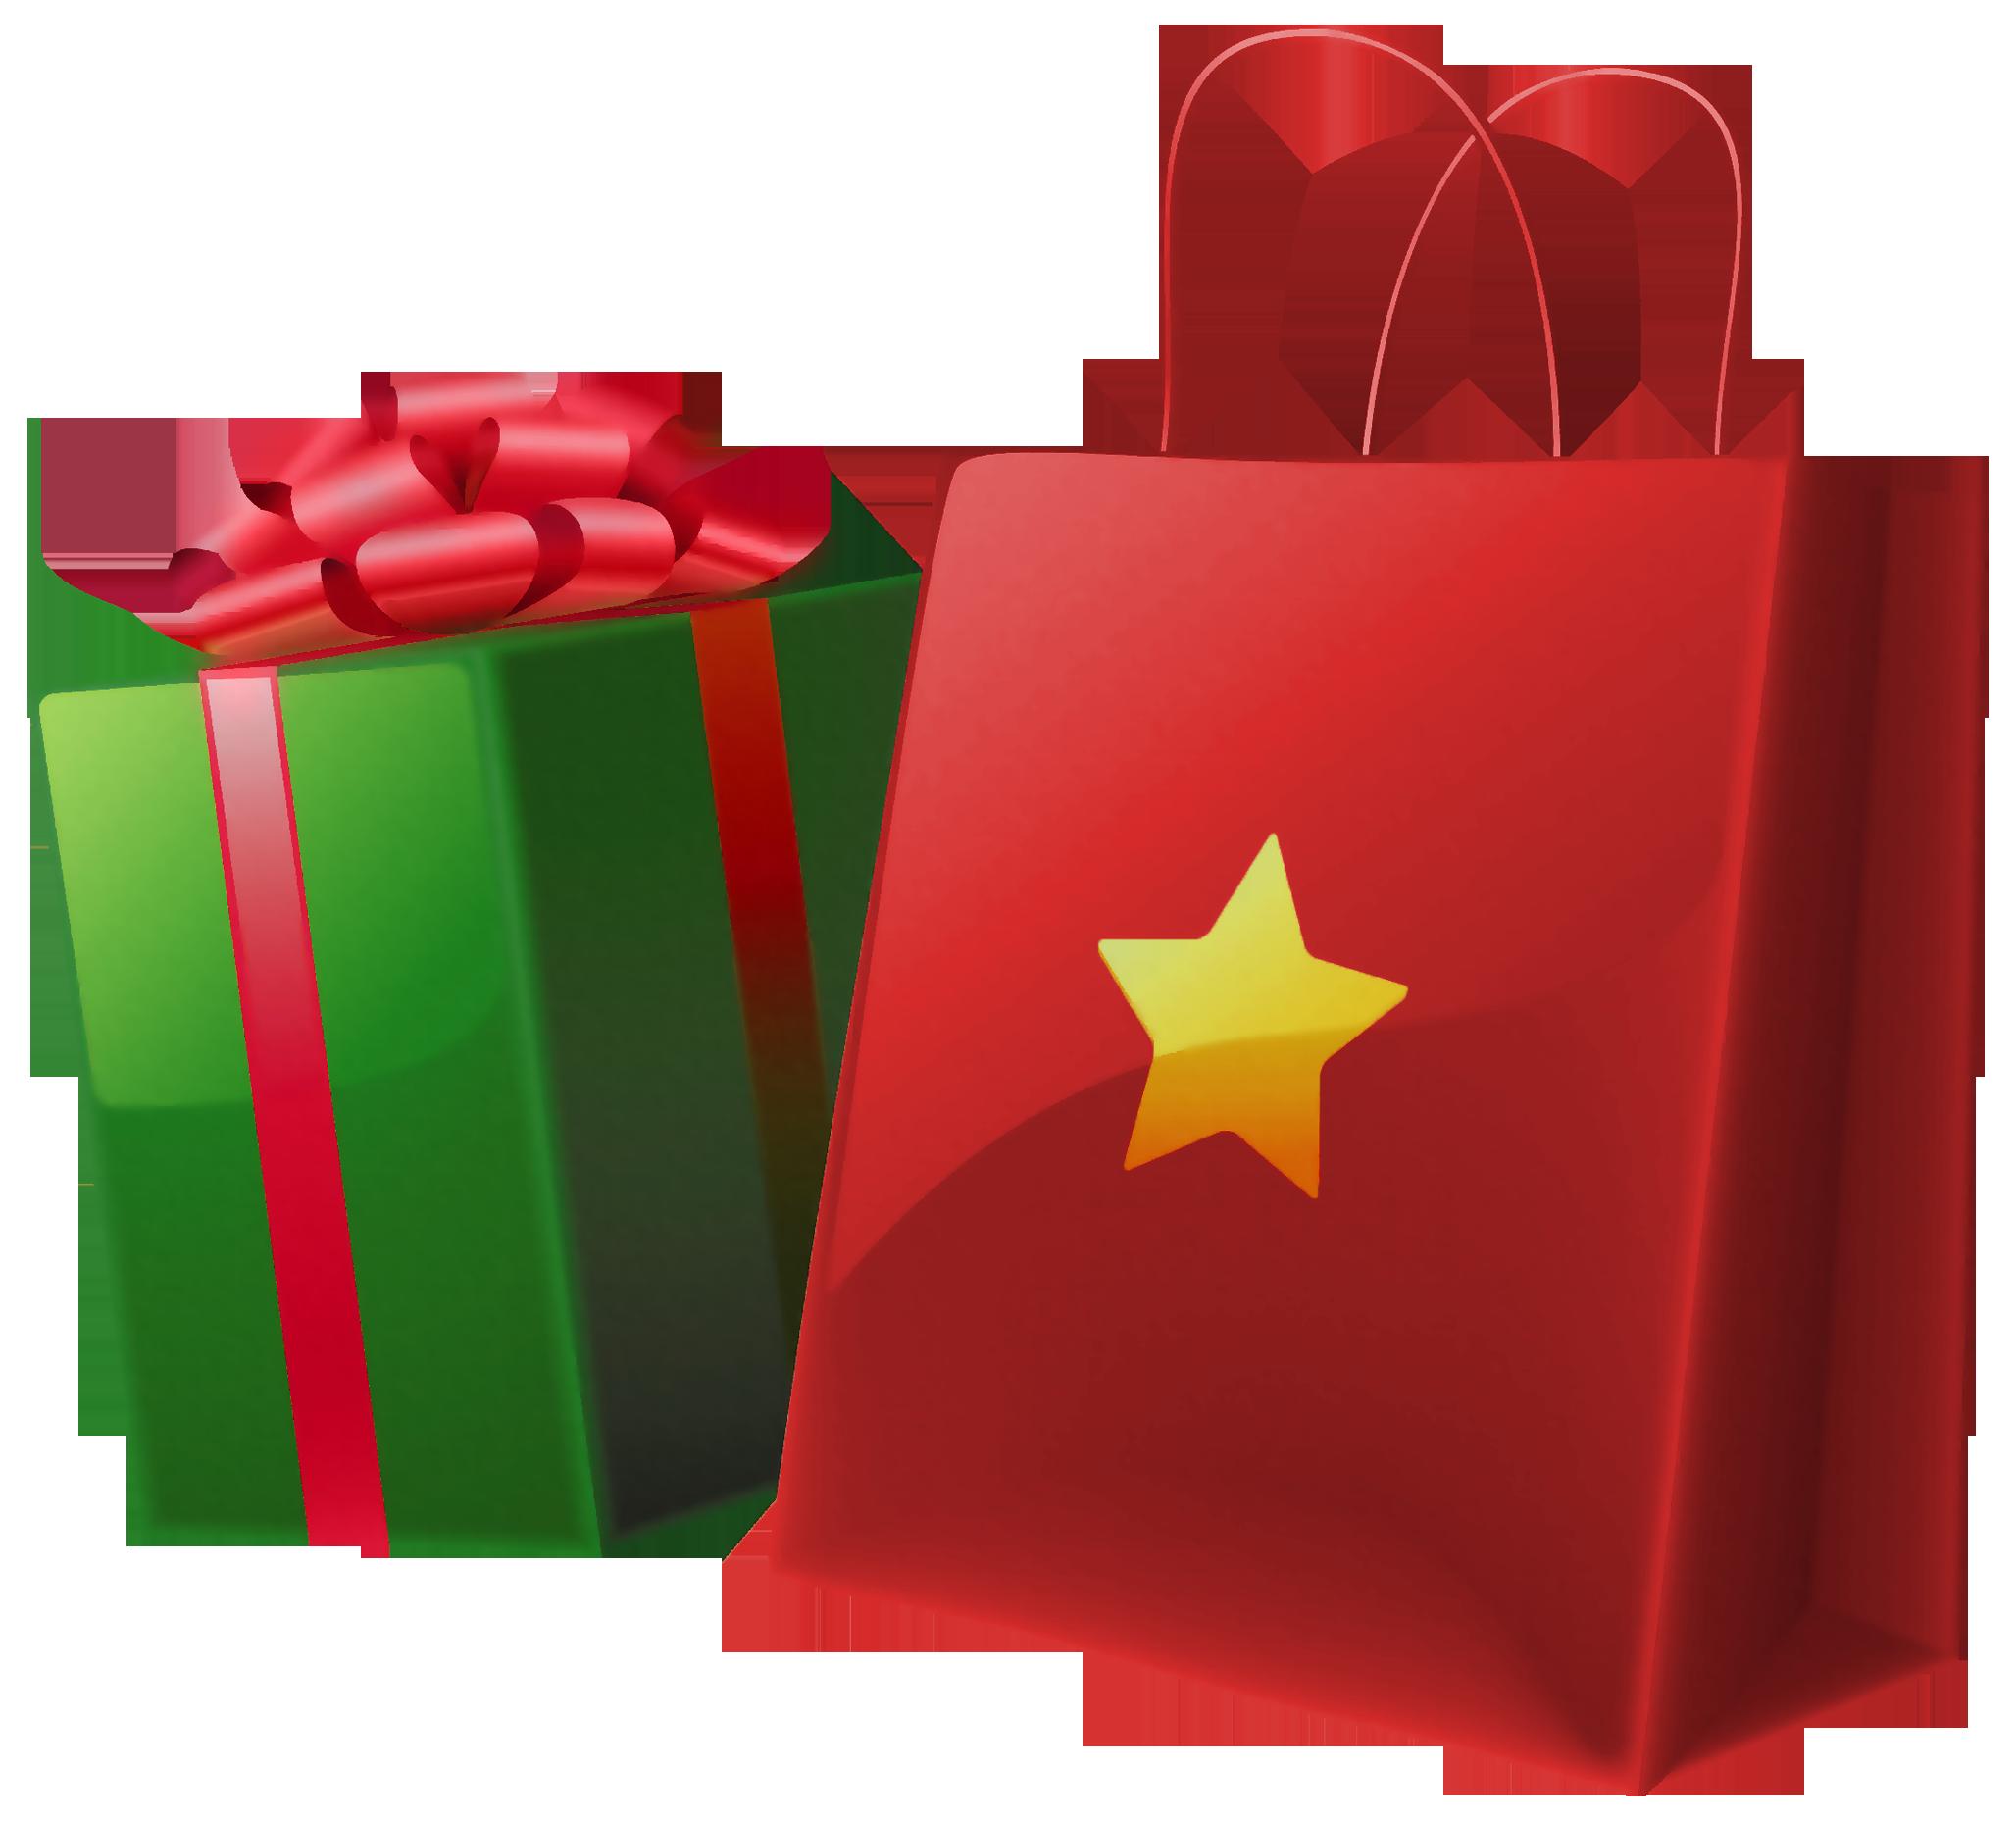 2056x1857 Bag Clipart Christmas Shopping